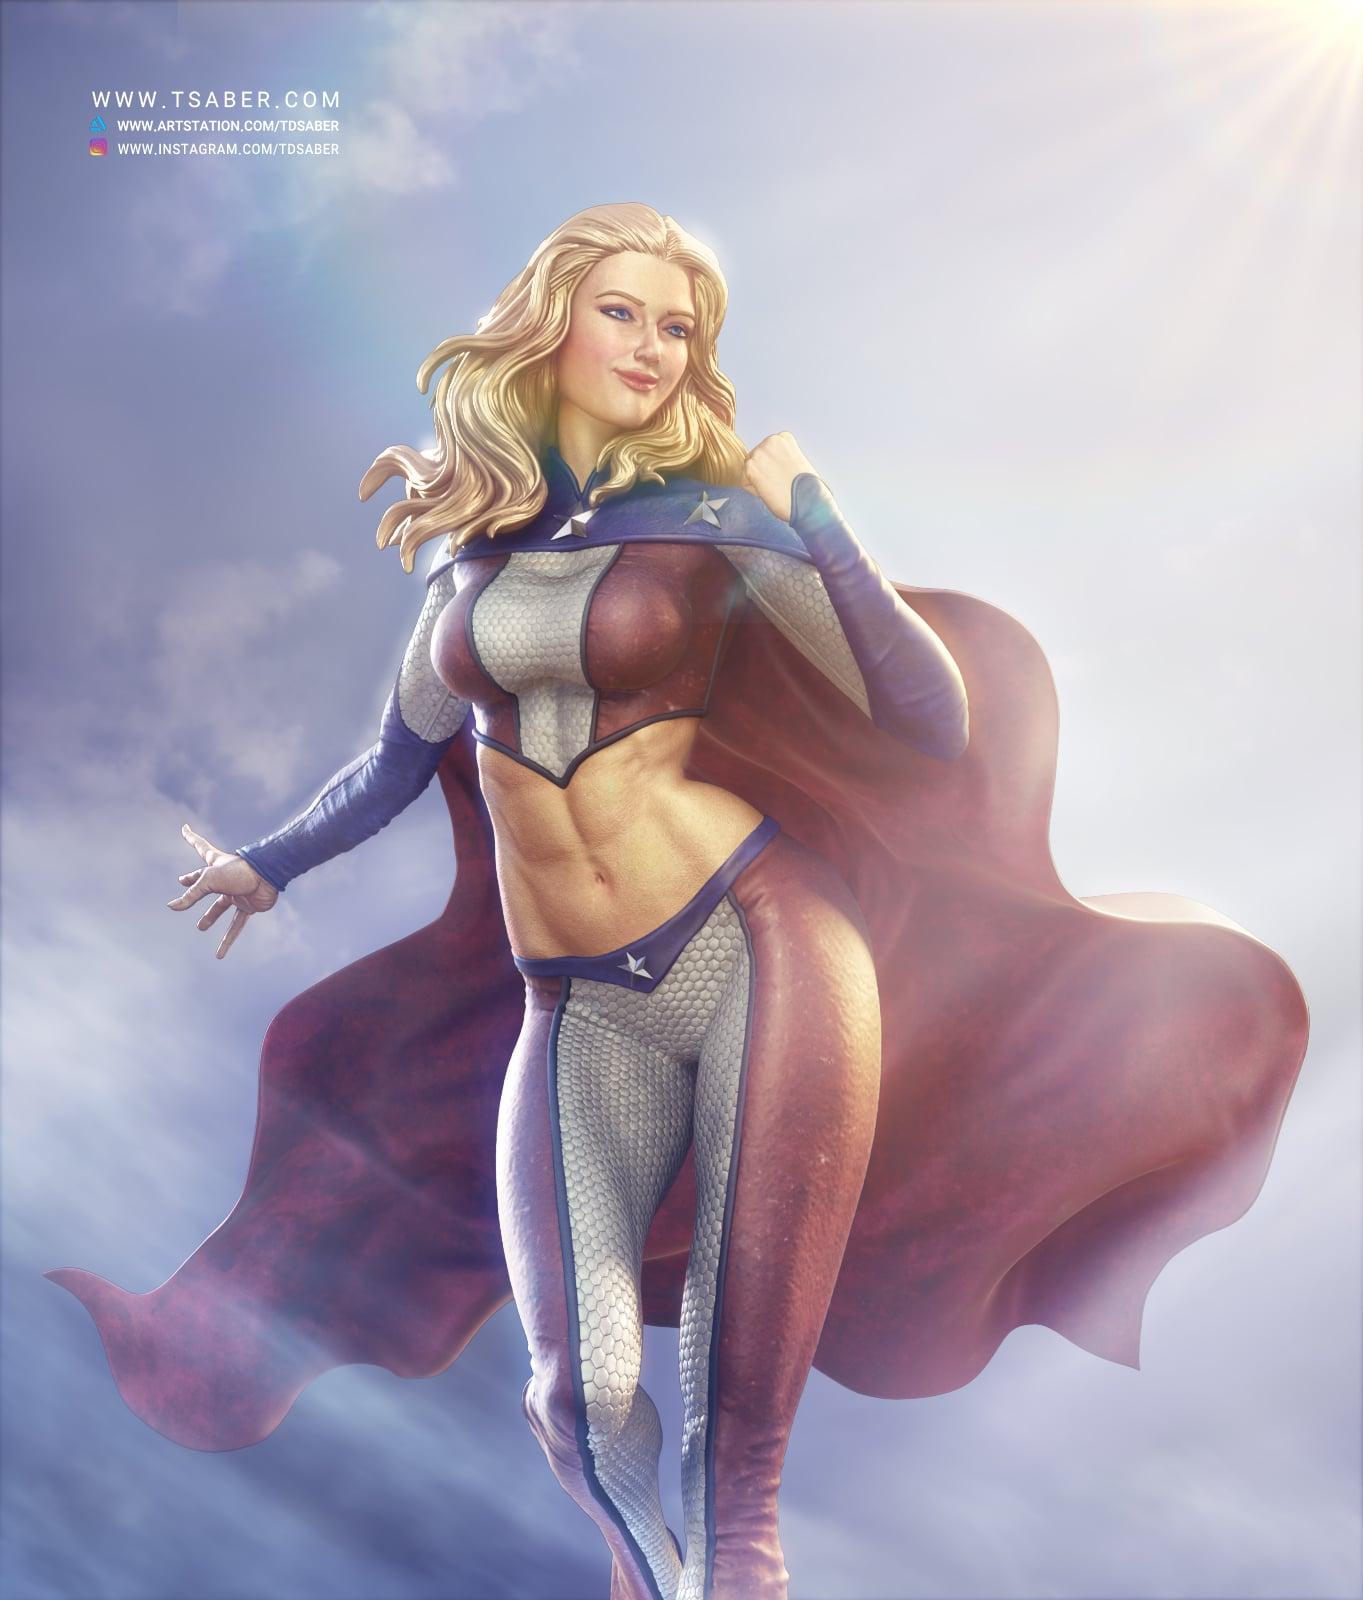 American Star 3d render - Superhero character- Tsaber